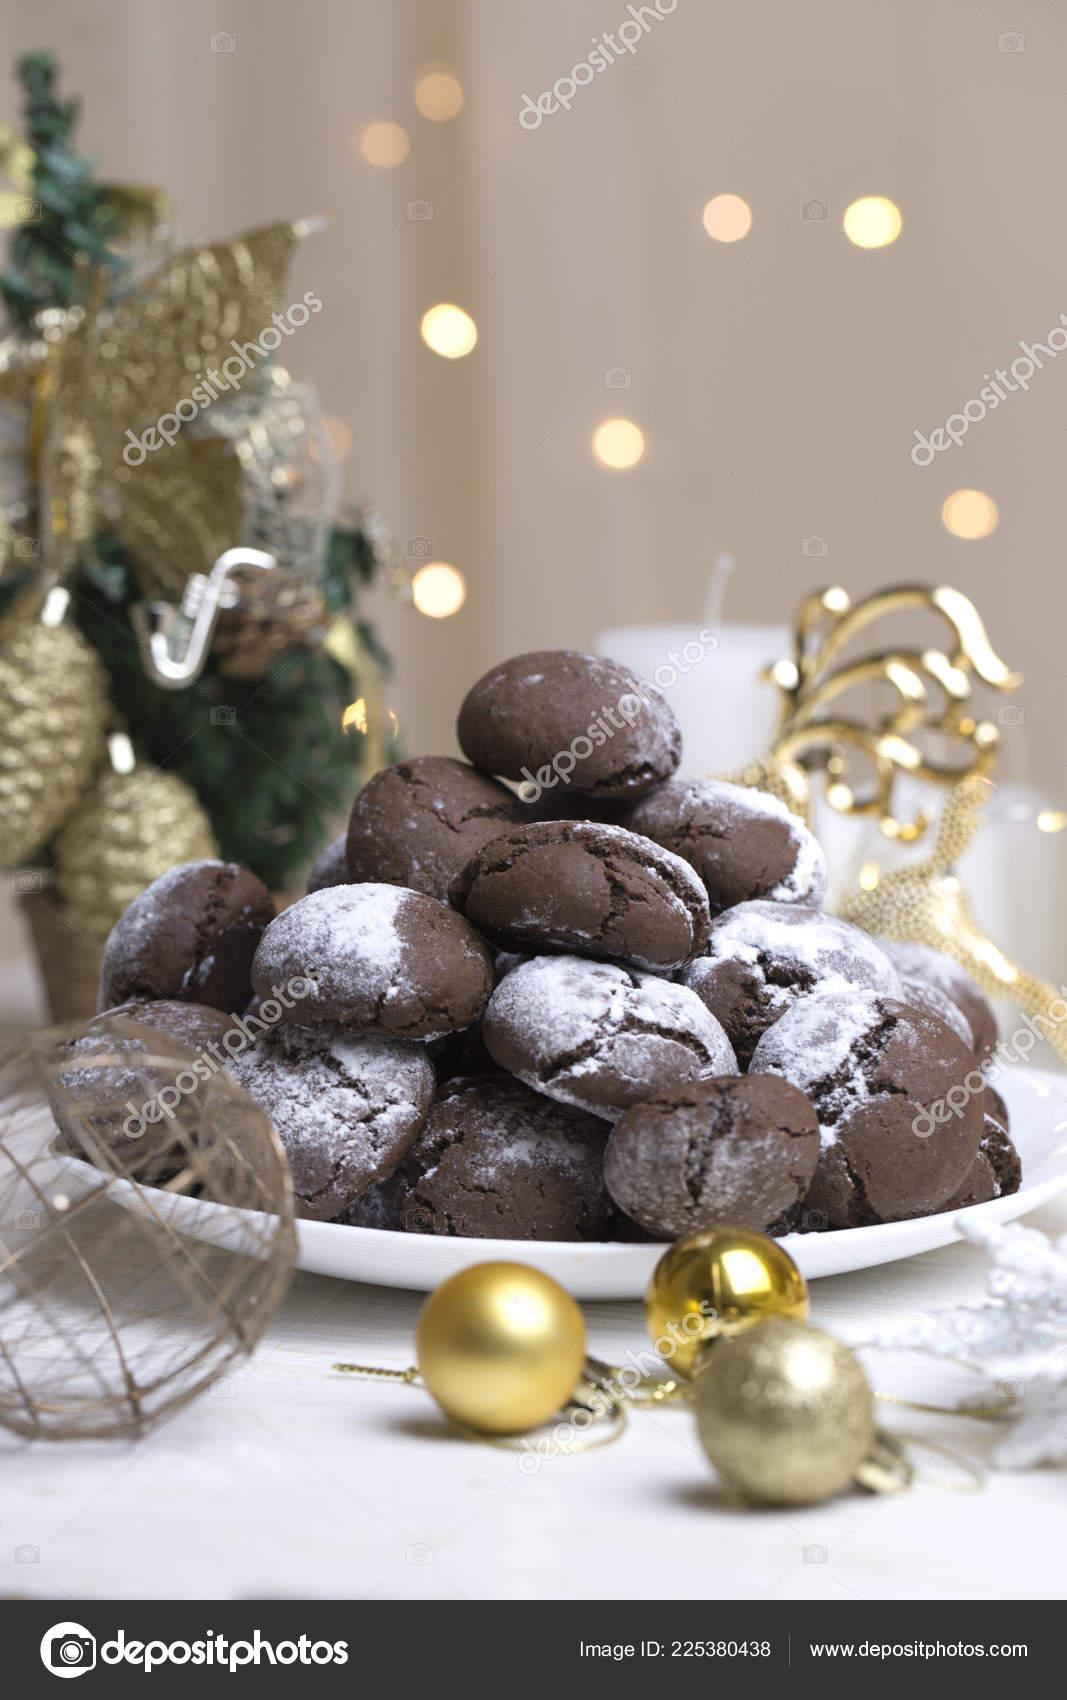 Chocolate Brownie Cookies Powdered Sugar Chocolate Cookies Christmas